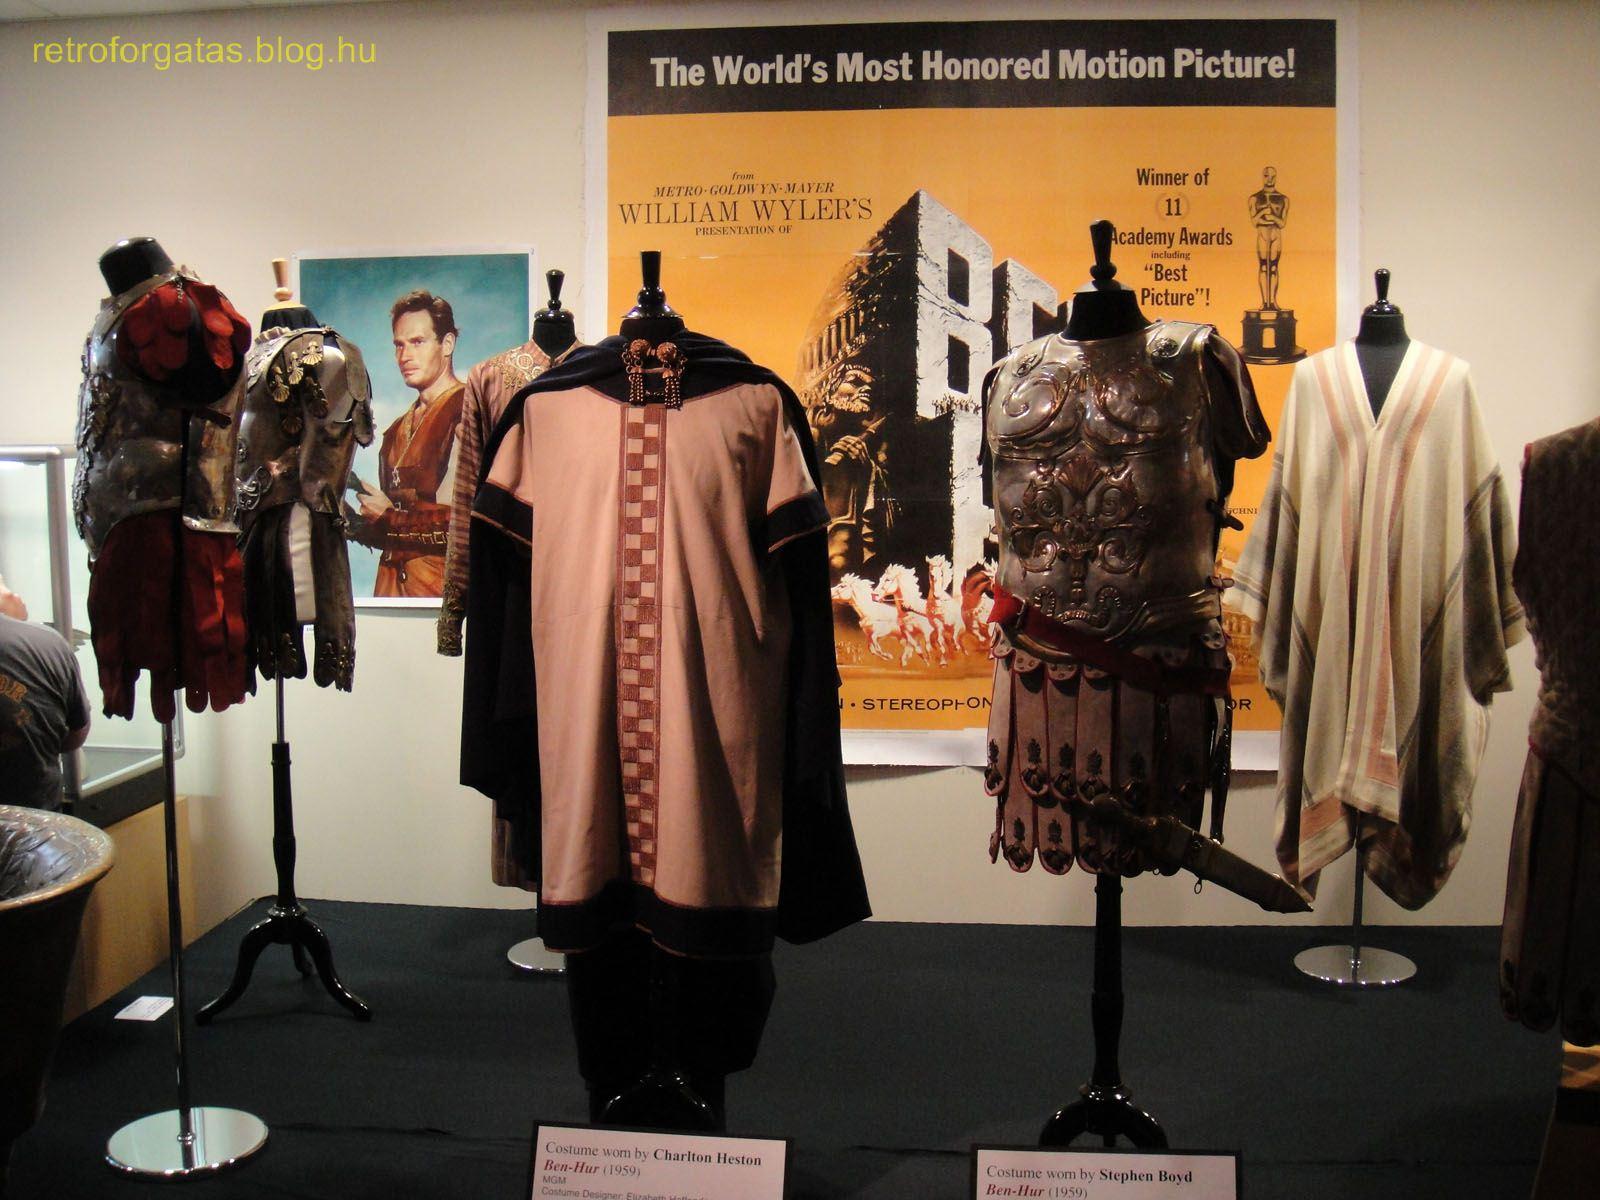 debbie_reynolds_auction_-ben-hur-_costumes_1959_5851596043_1.jpg